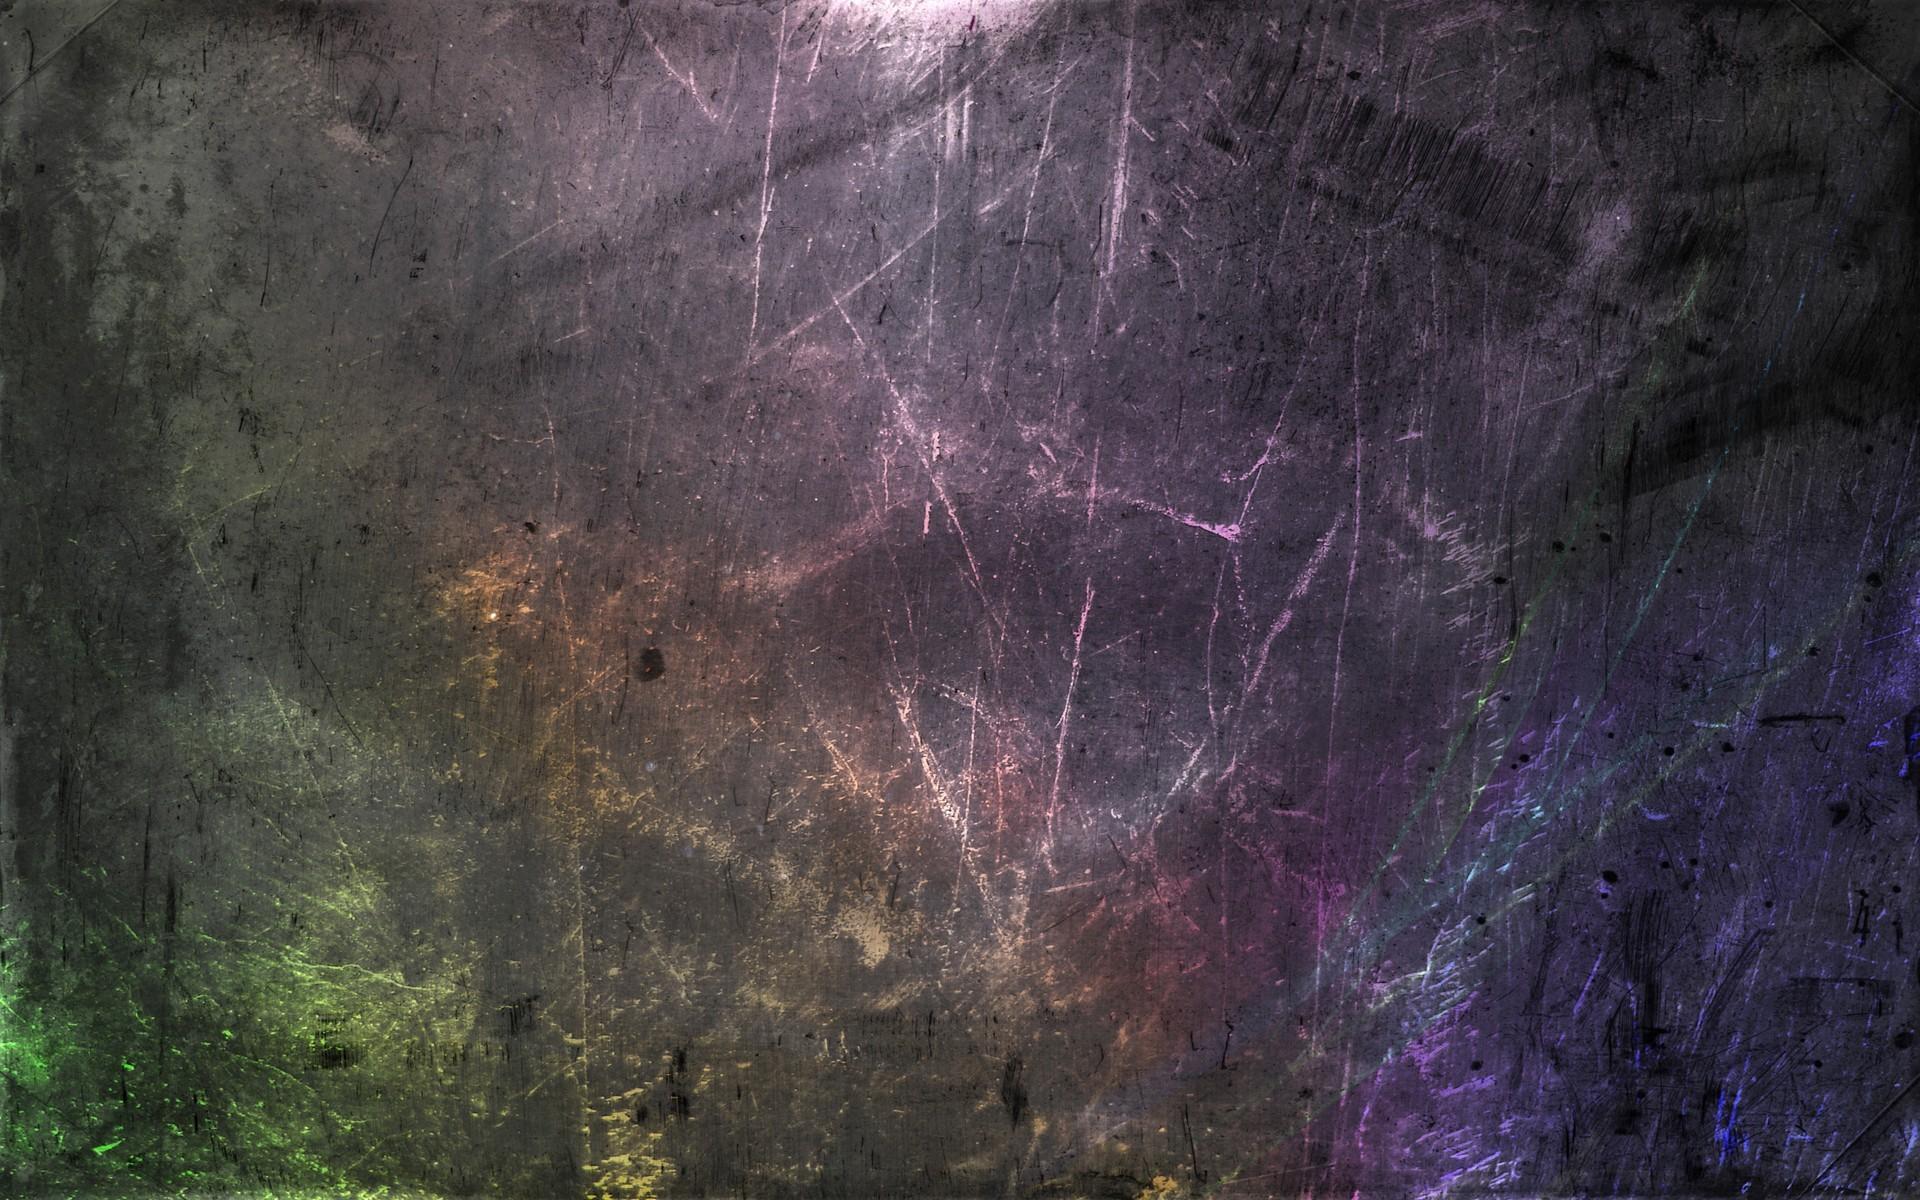 Grunge background Tumblr ·① Download free amazing HD ...